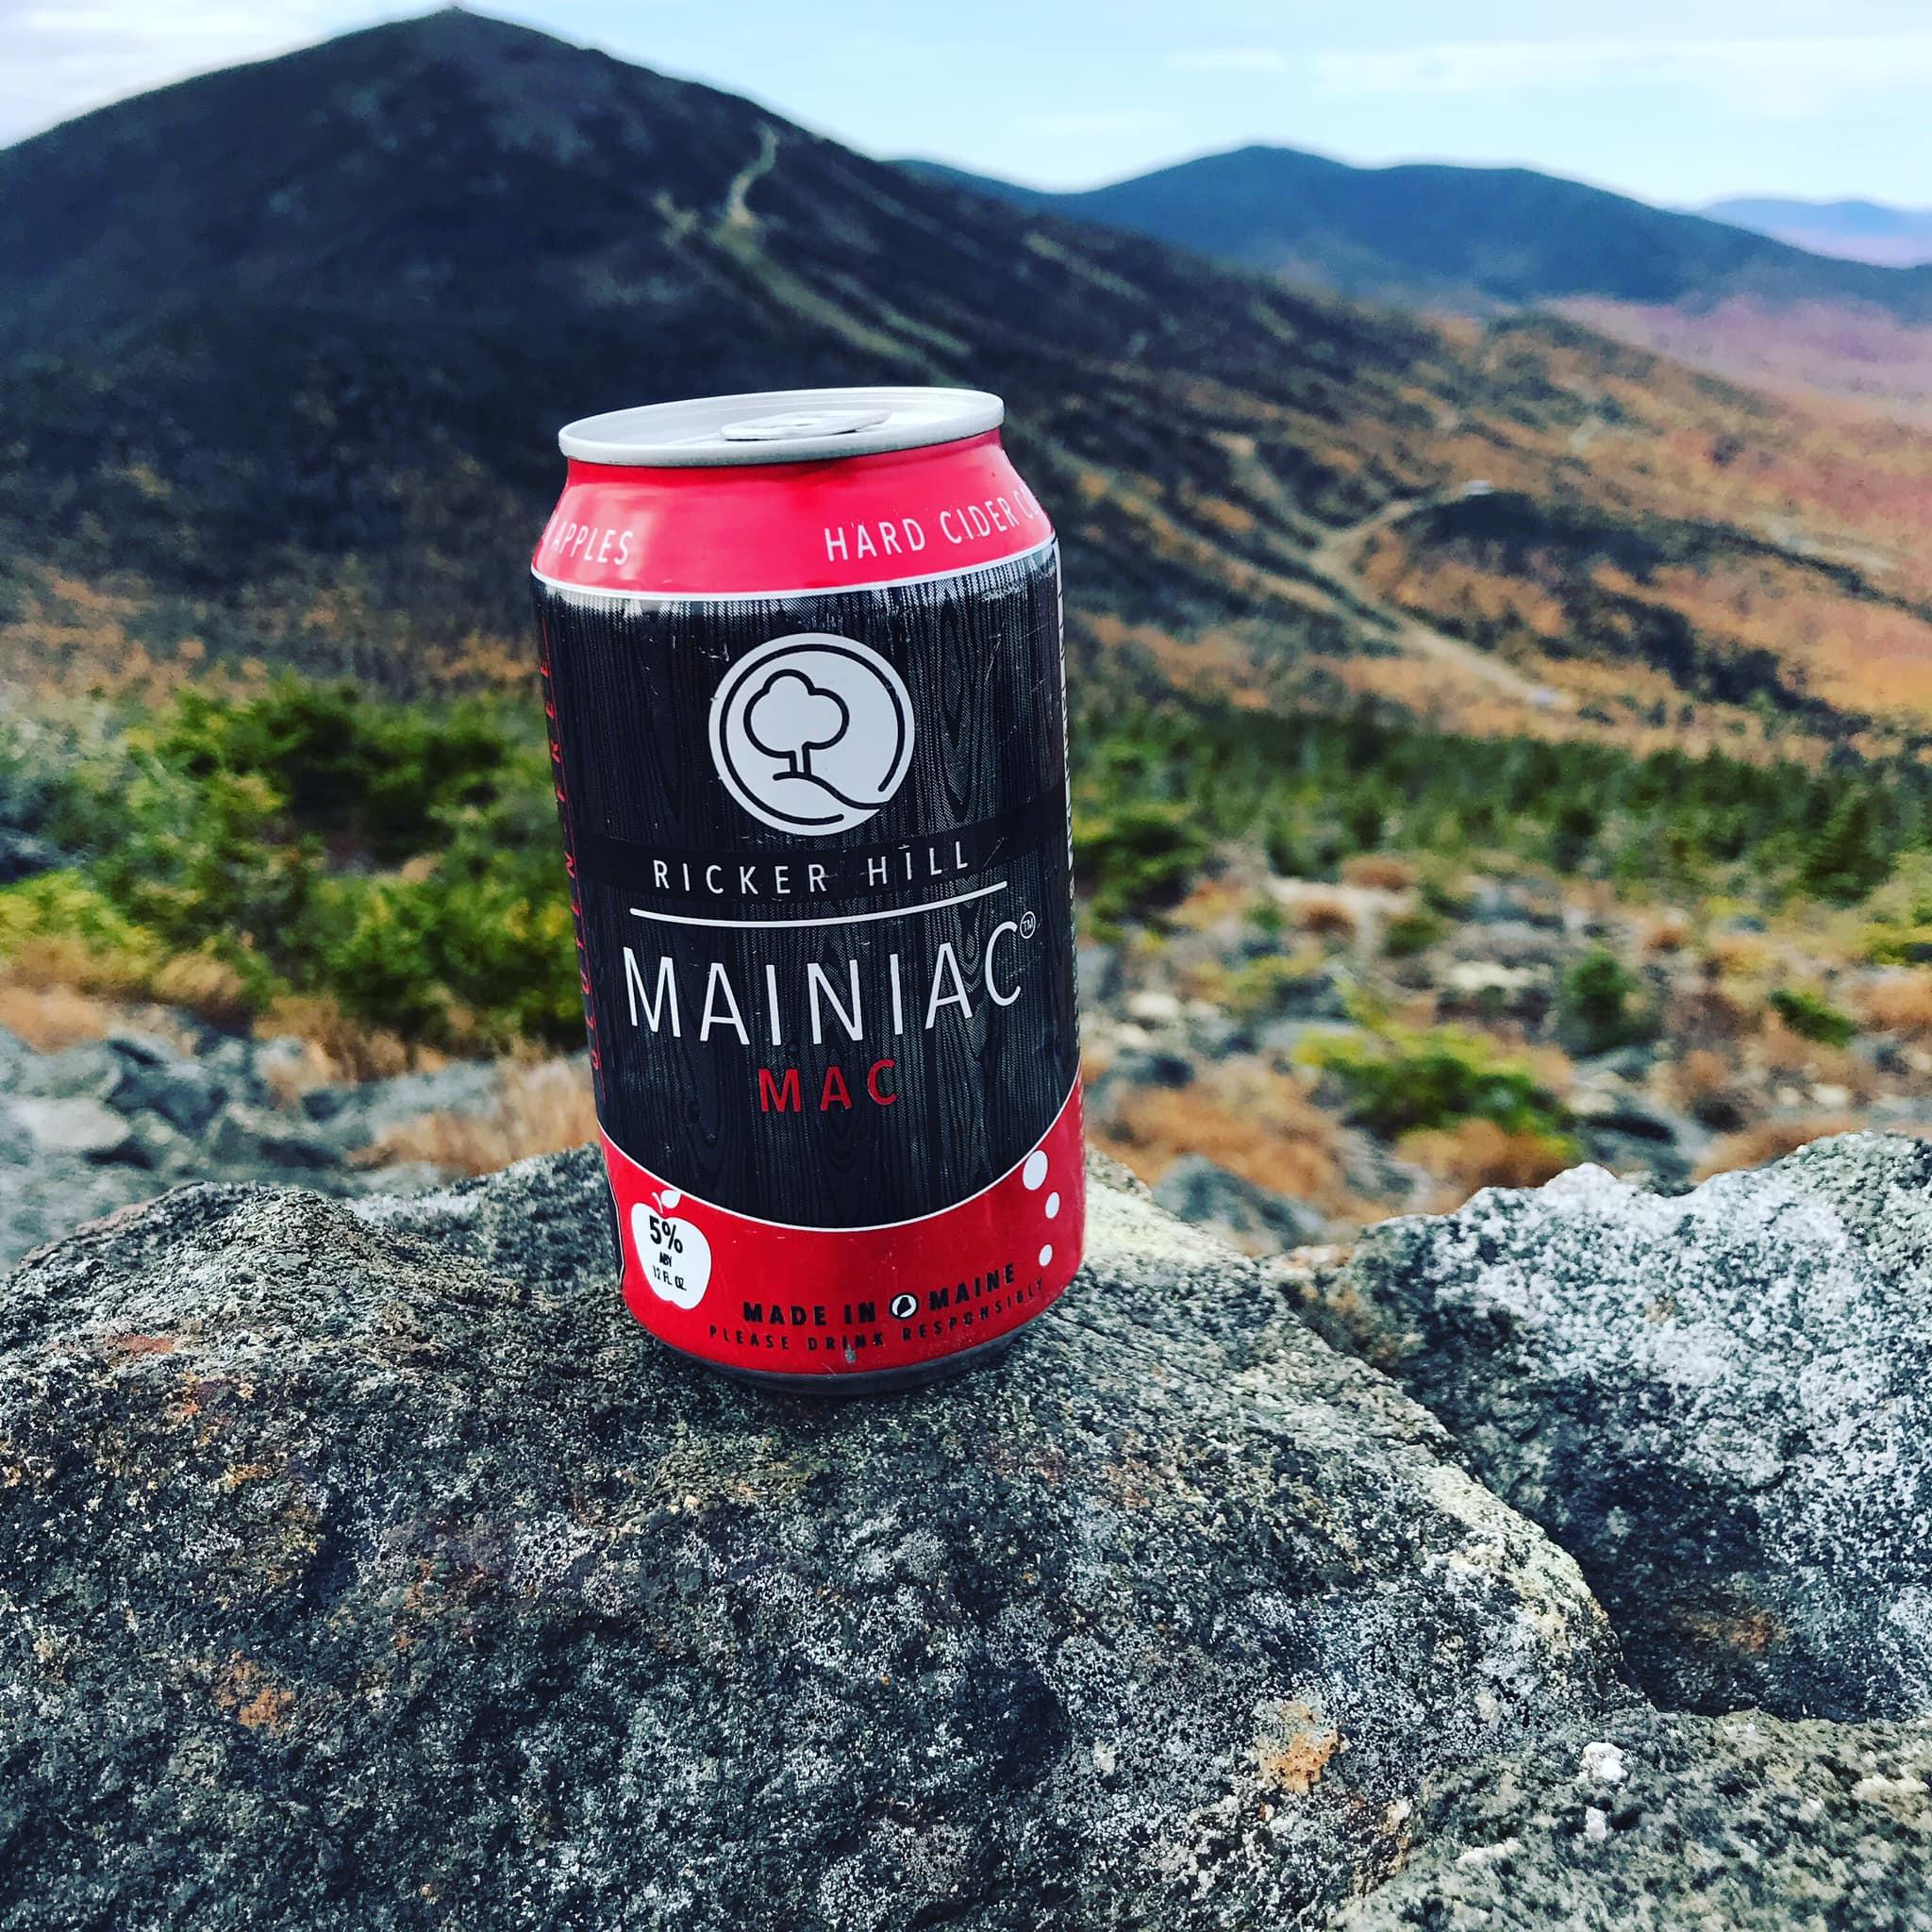 Ricker Hill Mainiac Mac Hard Cider